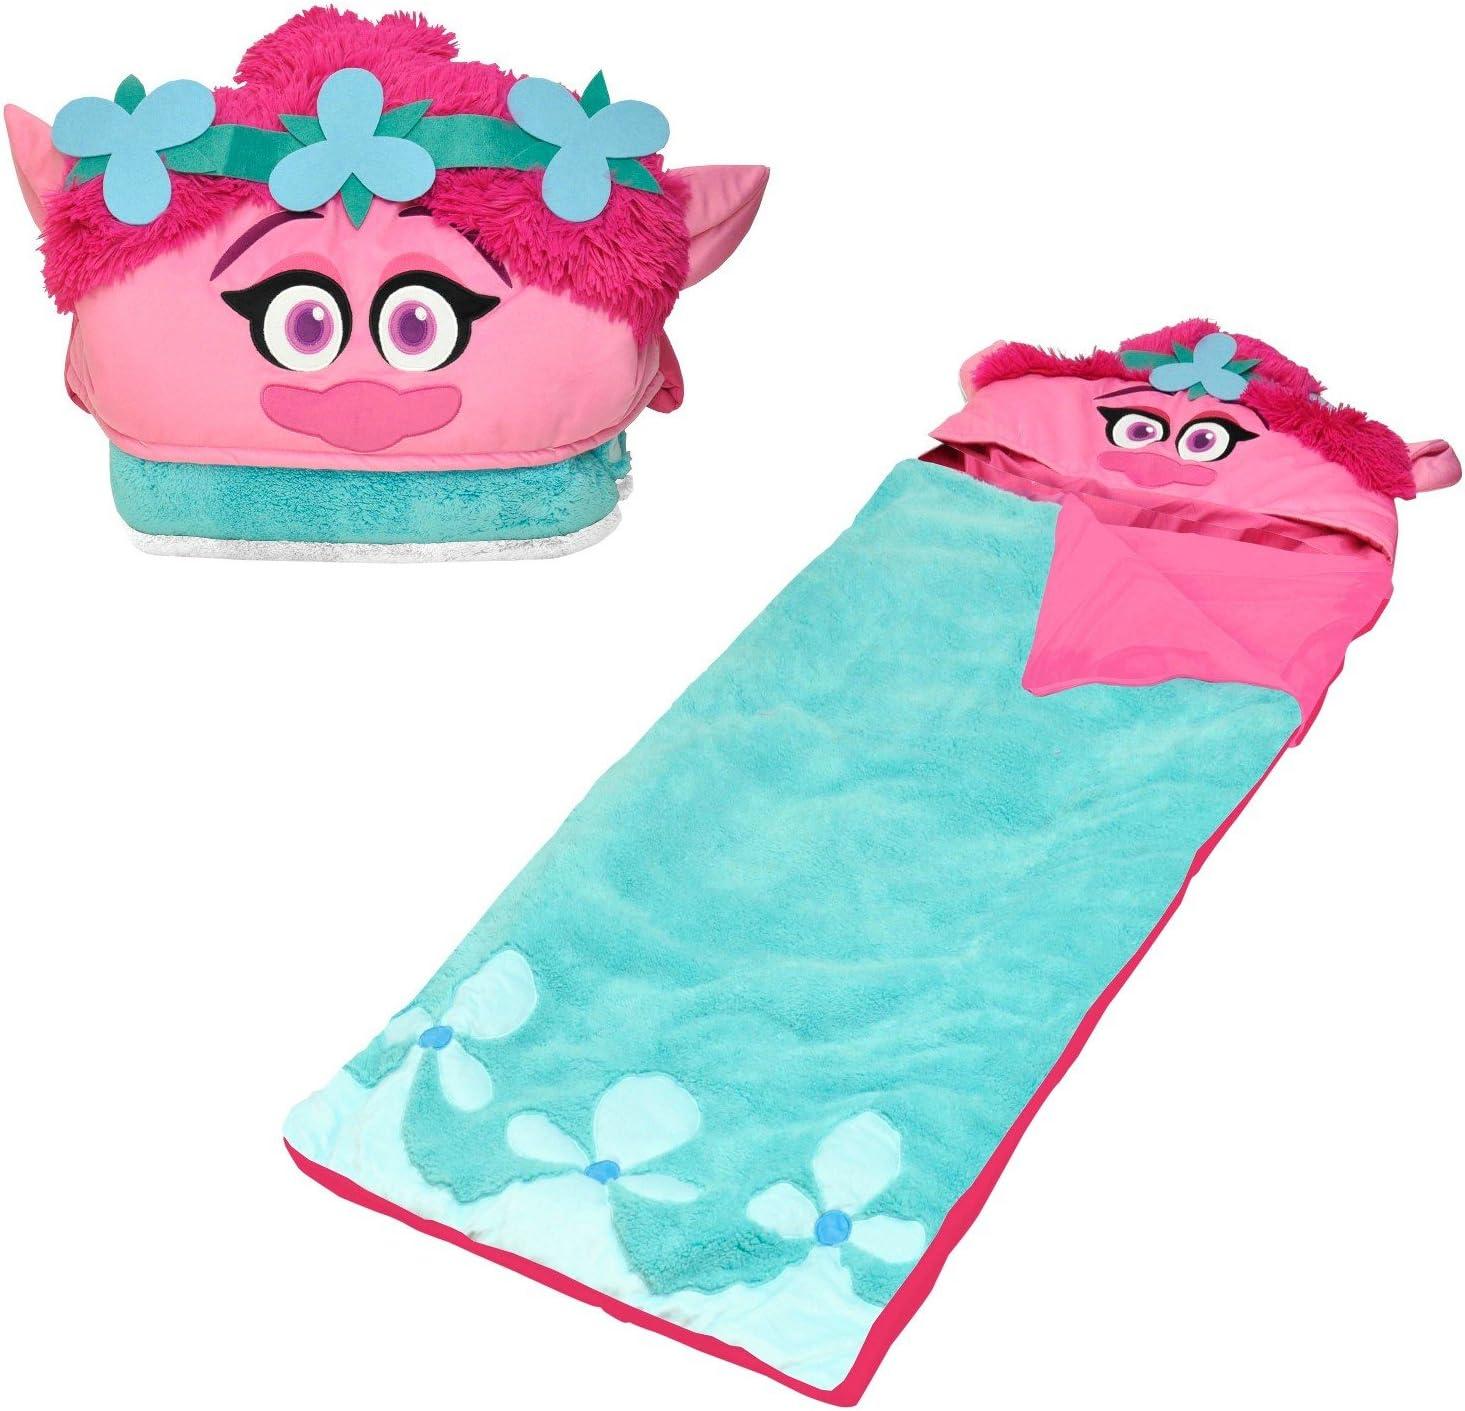 DreamWorks Trolls Sleeping Bag, Pink and Light Blue